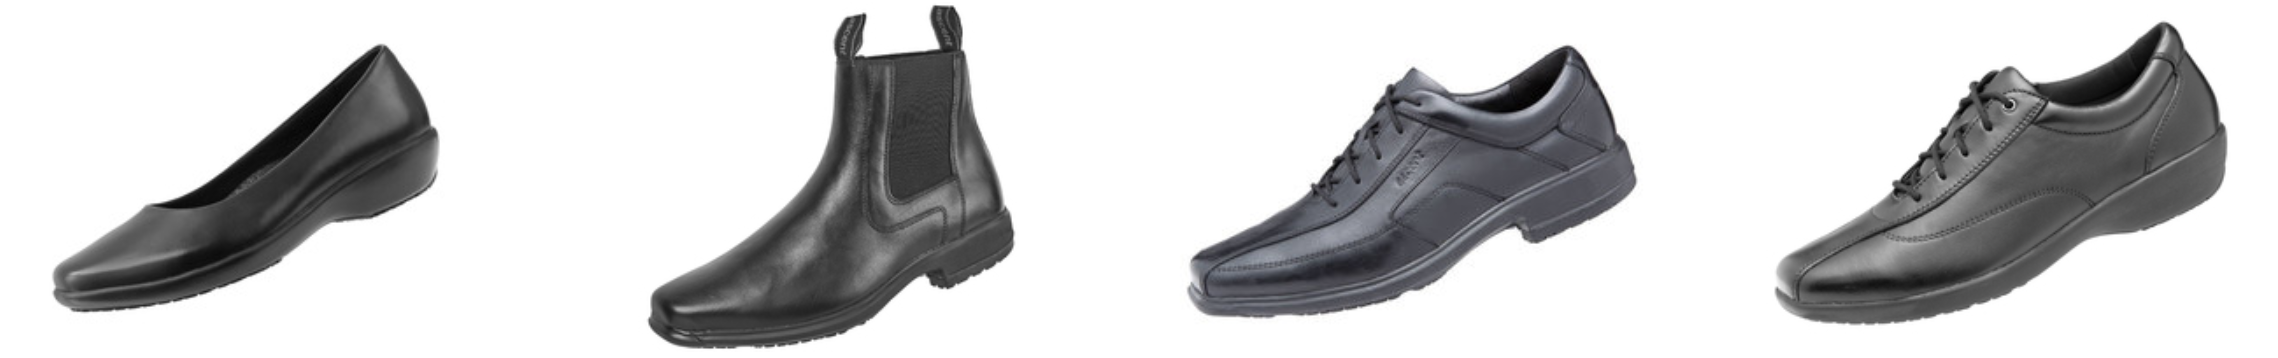 Slip-Resistant Black Leather Work Shoes